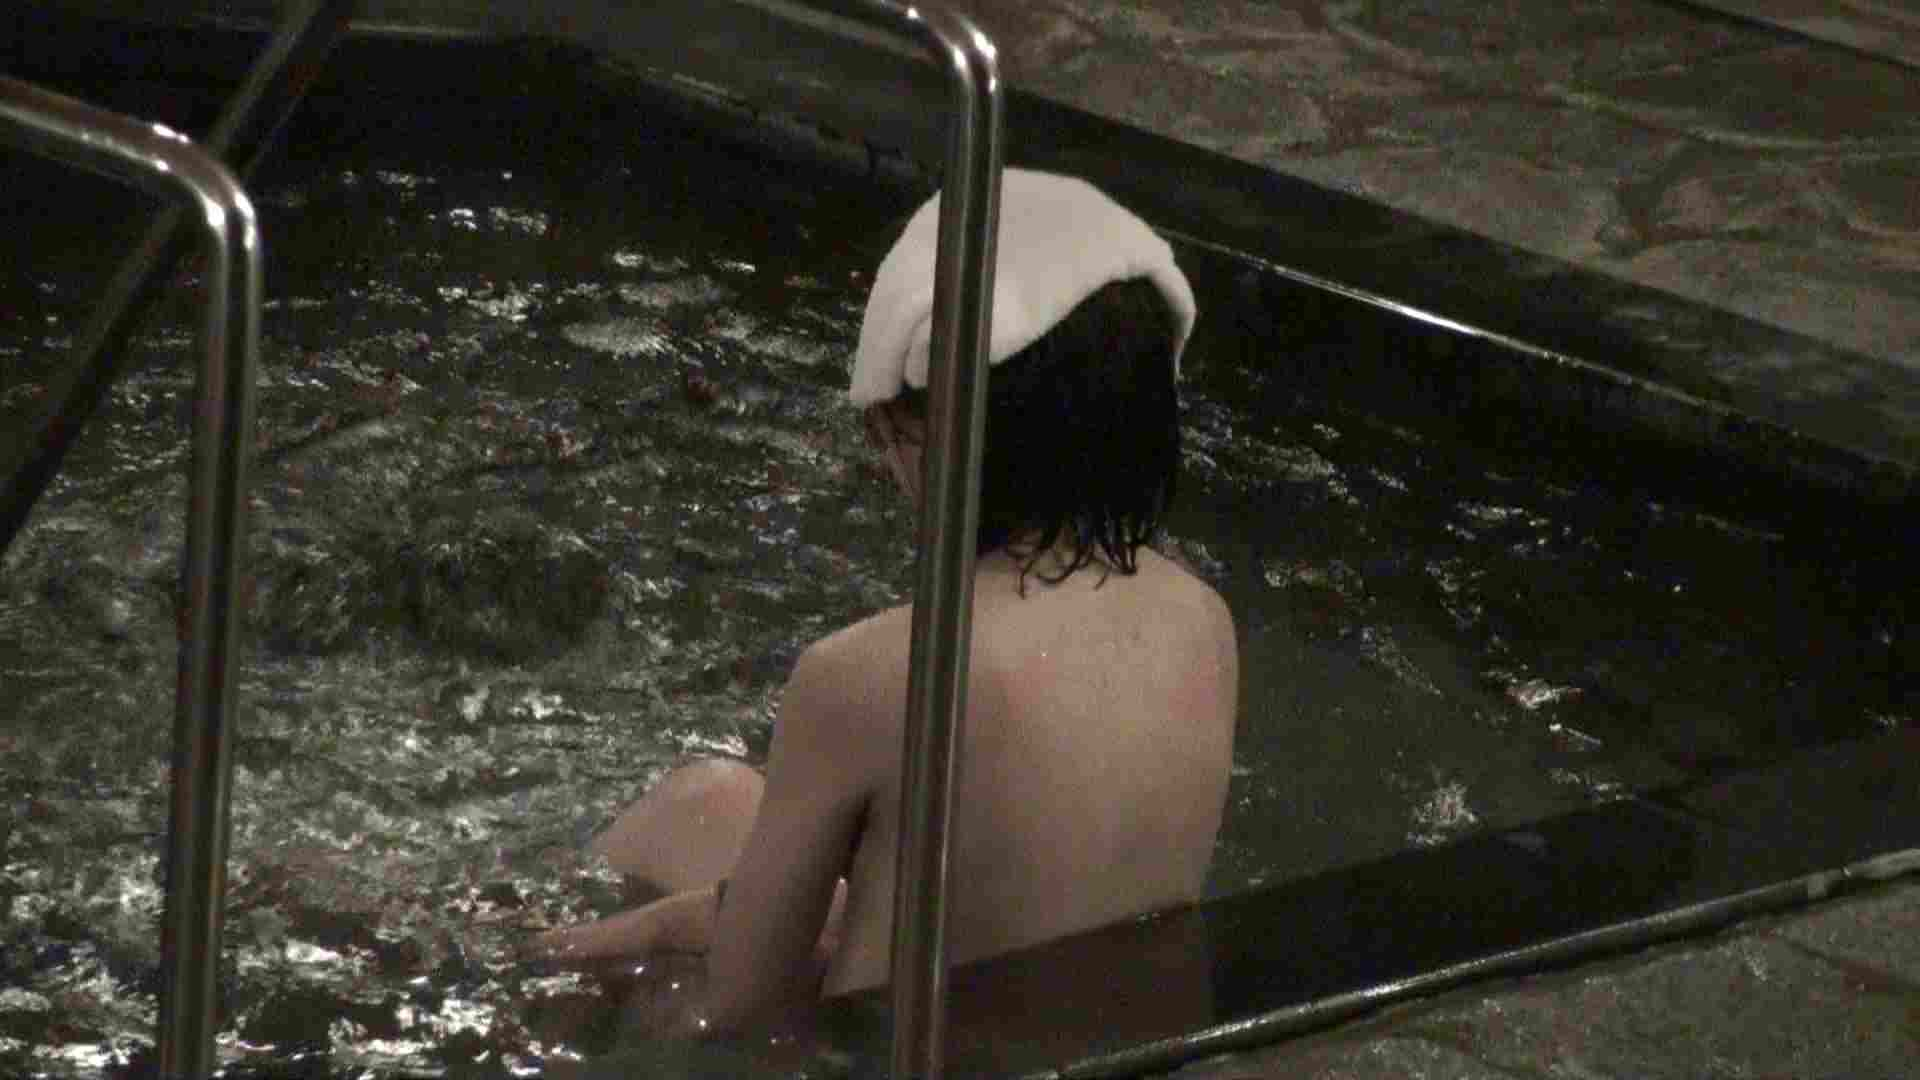 Aquaな露天風呂Vol.352 盗撮大放出 濡れ場動画紹介 75連発 30